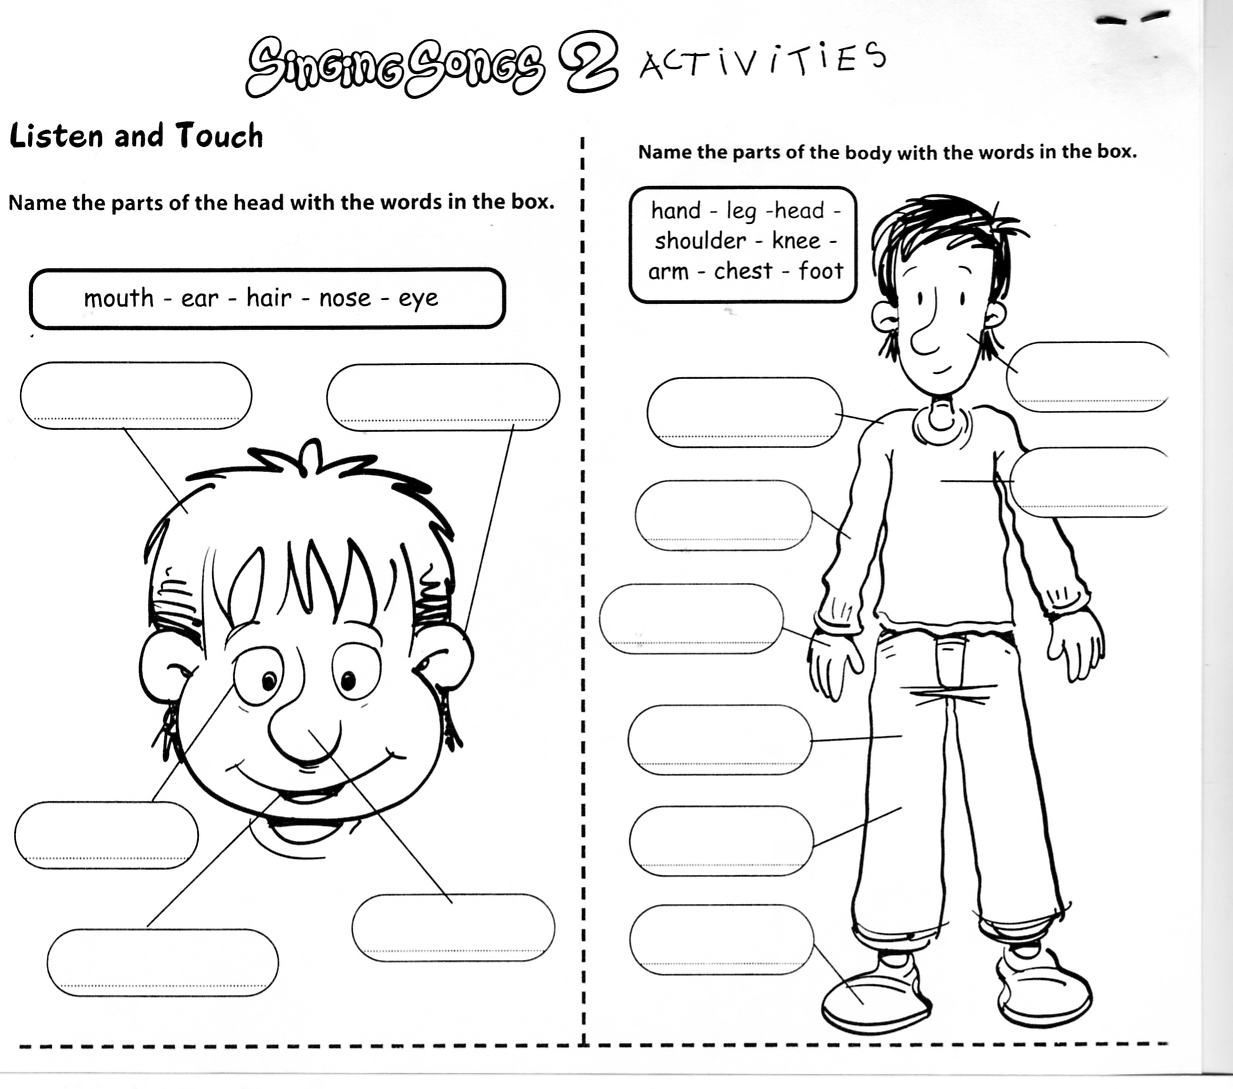 hight resolution of learningenglish-esl: BODY WORKSHEETS   Alphabet worksheets preschool